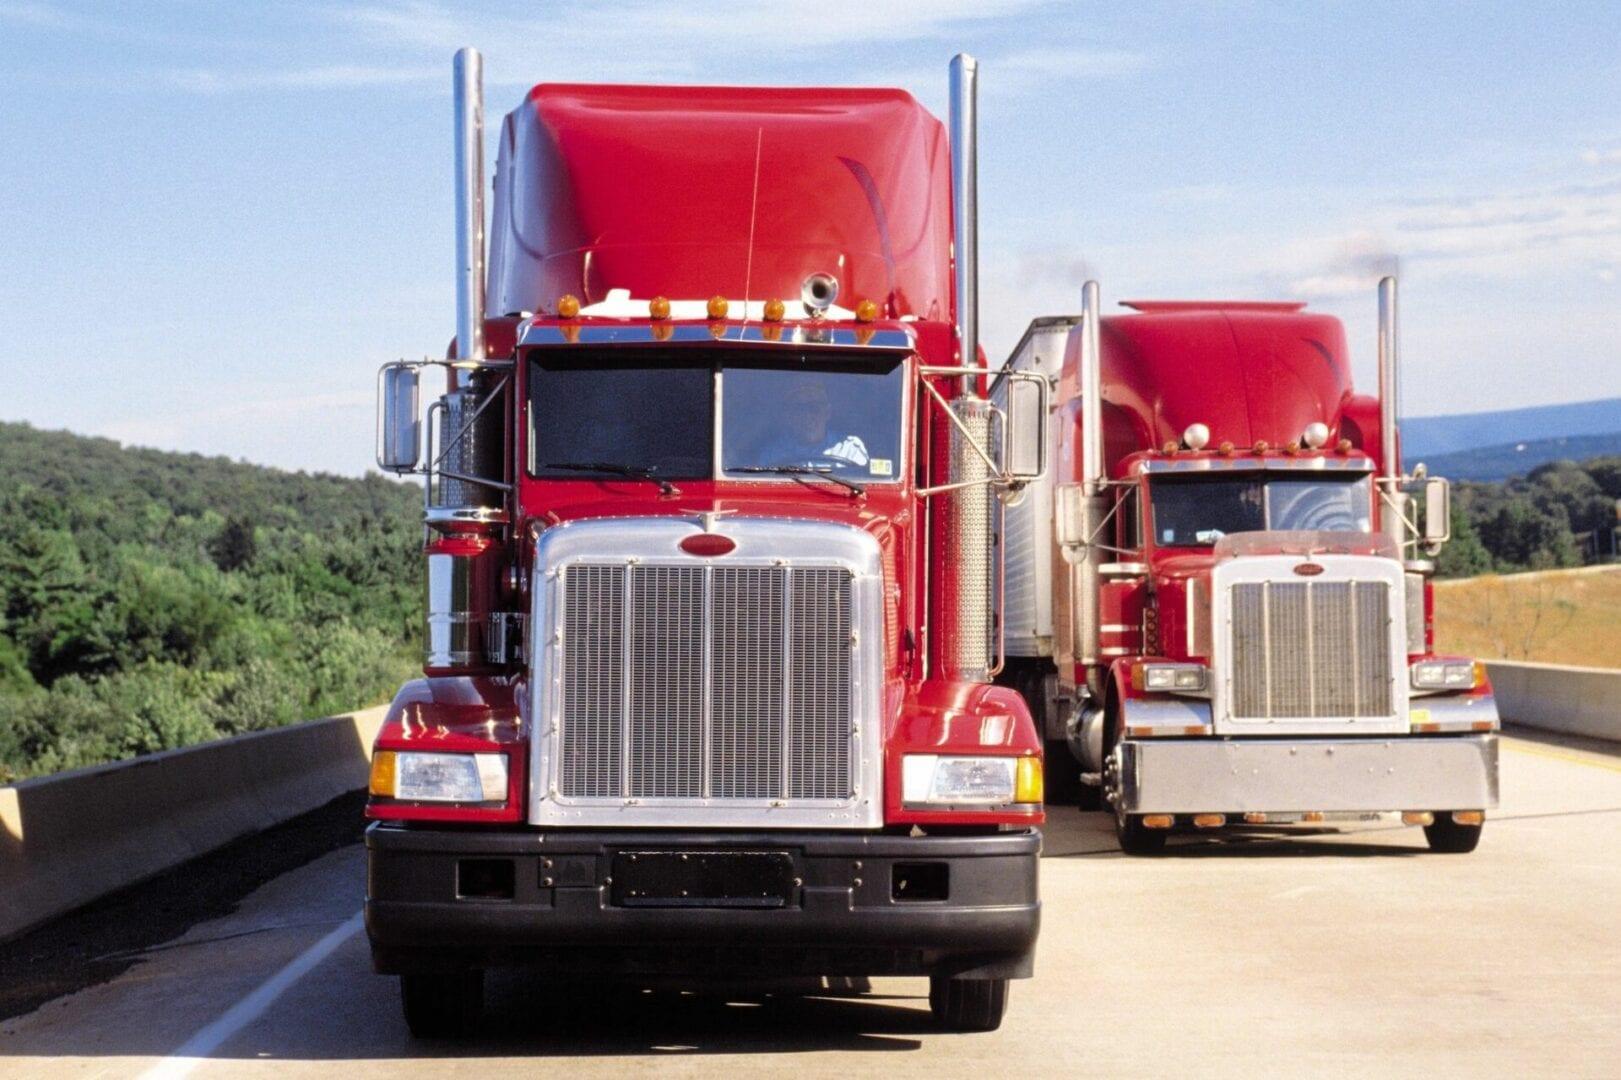 2 red peterbilt trucks